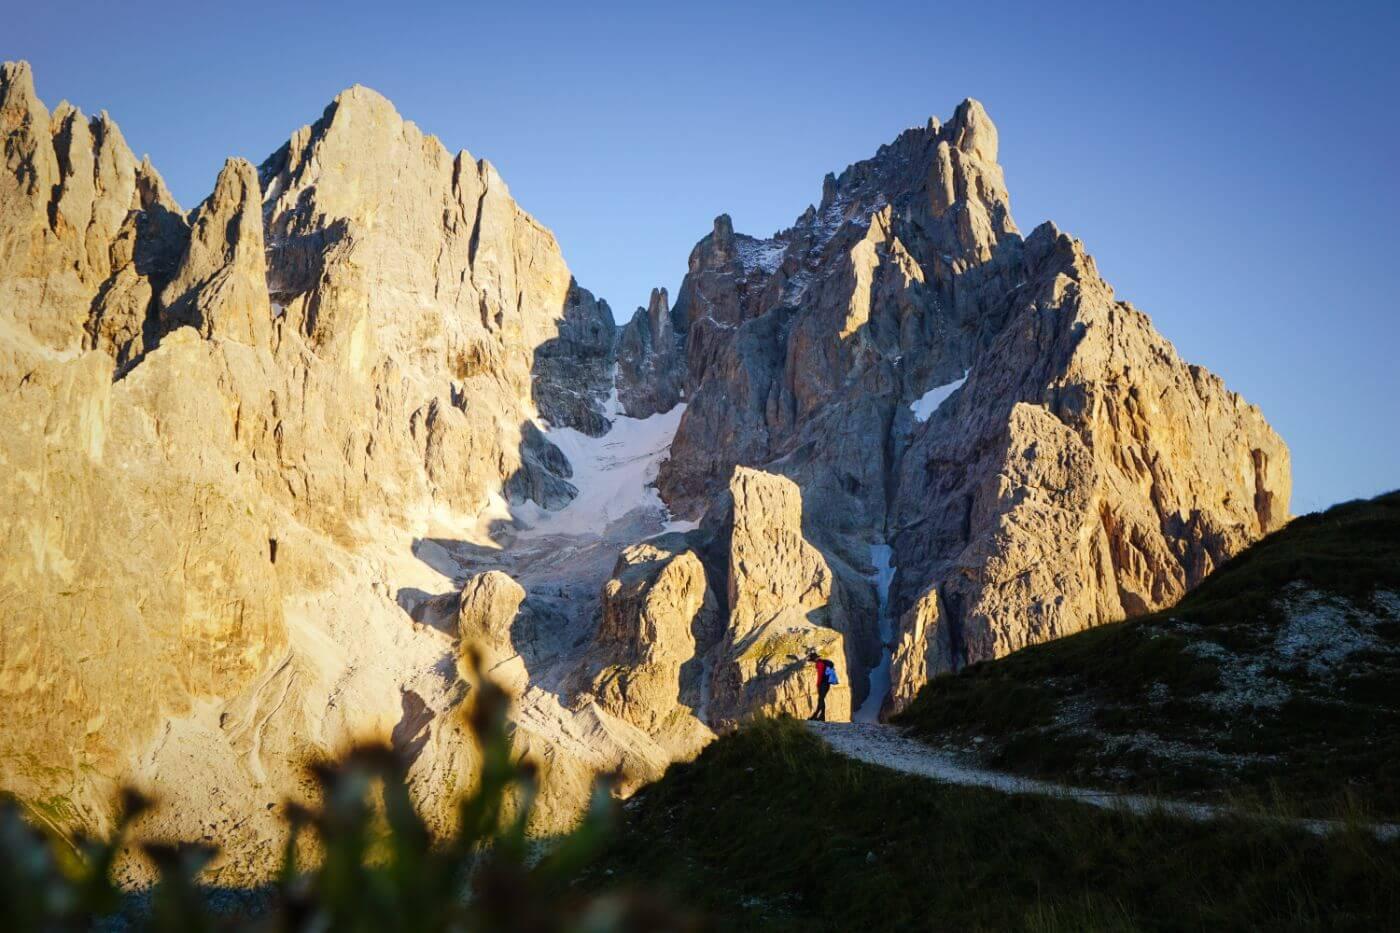 Baita Segantini Loop Trail - Best Day Hikes in the Dolomites